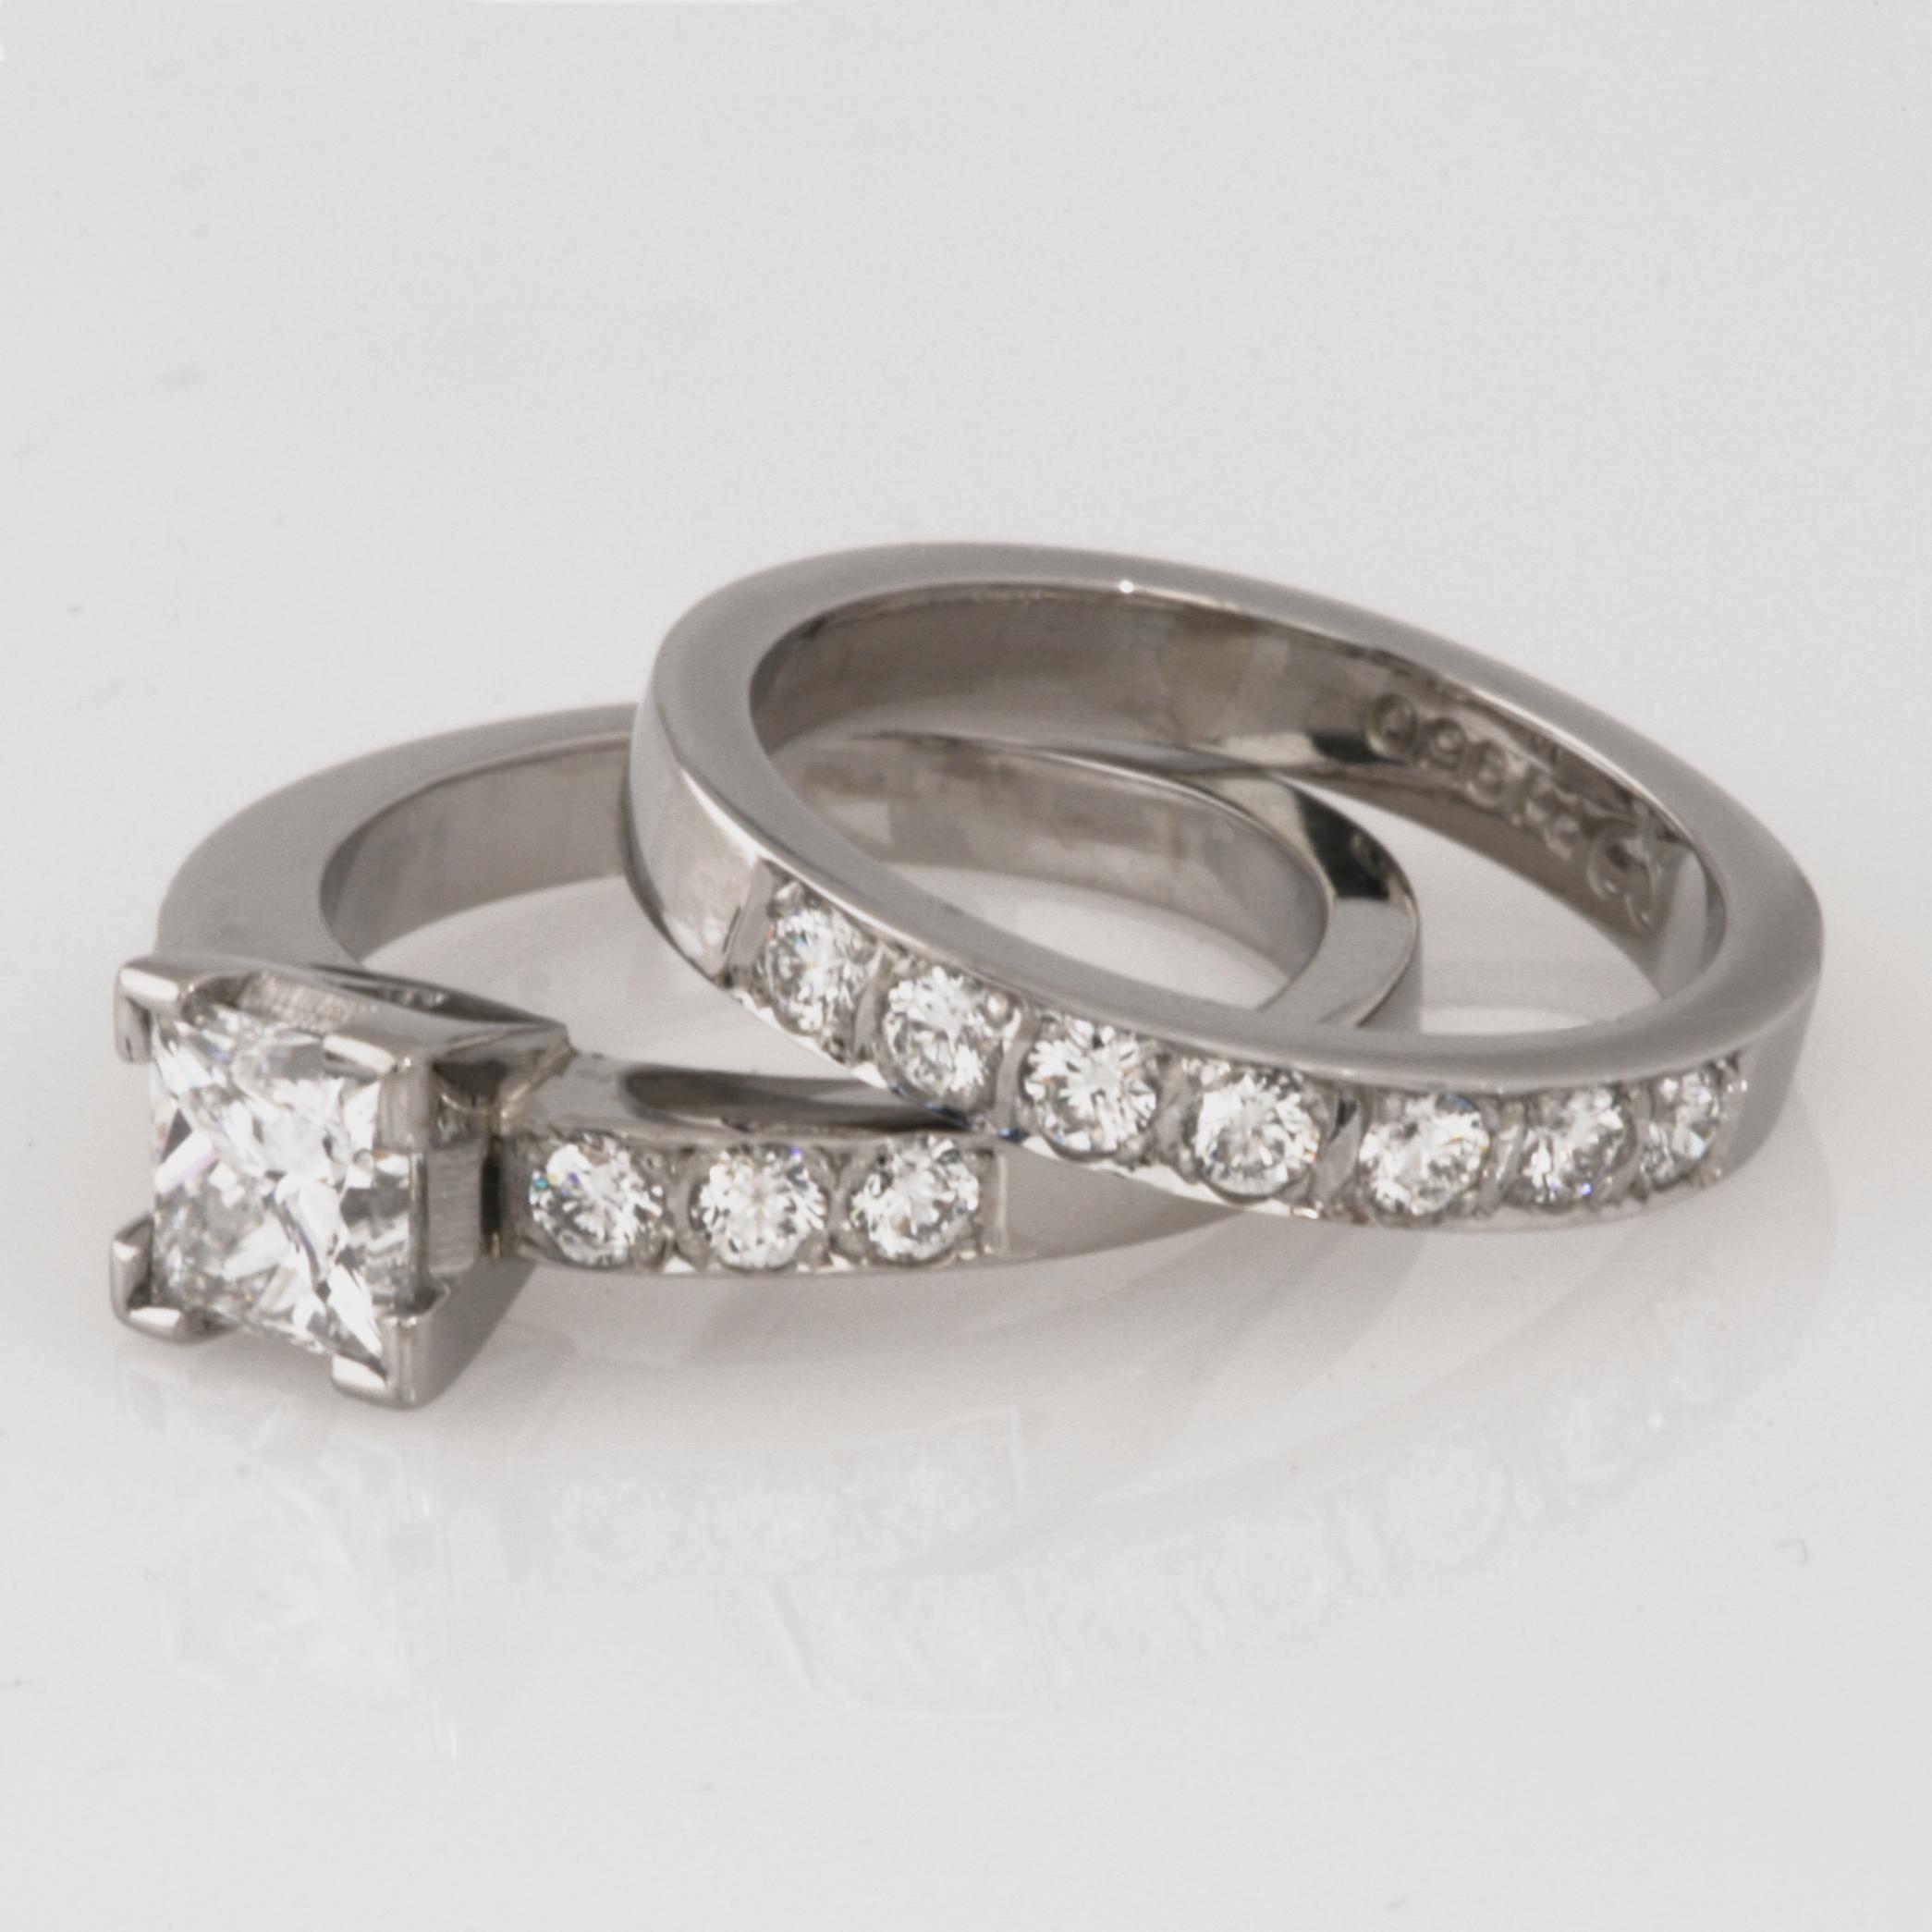 Handmade ladies palladium brilliant cut diamond wedding ring set